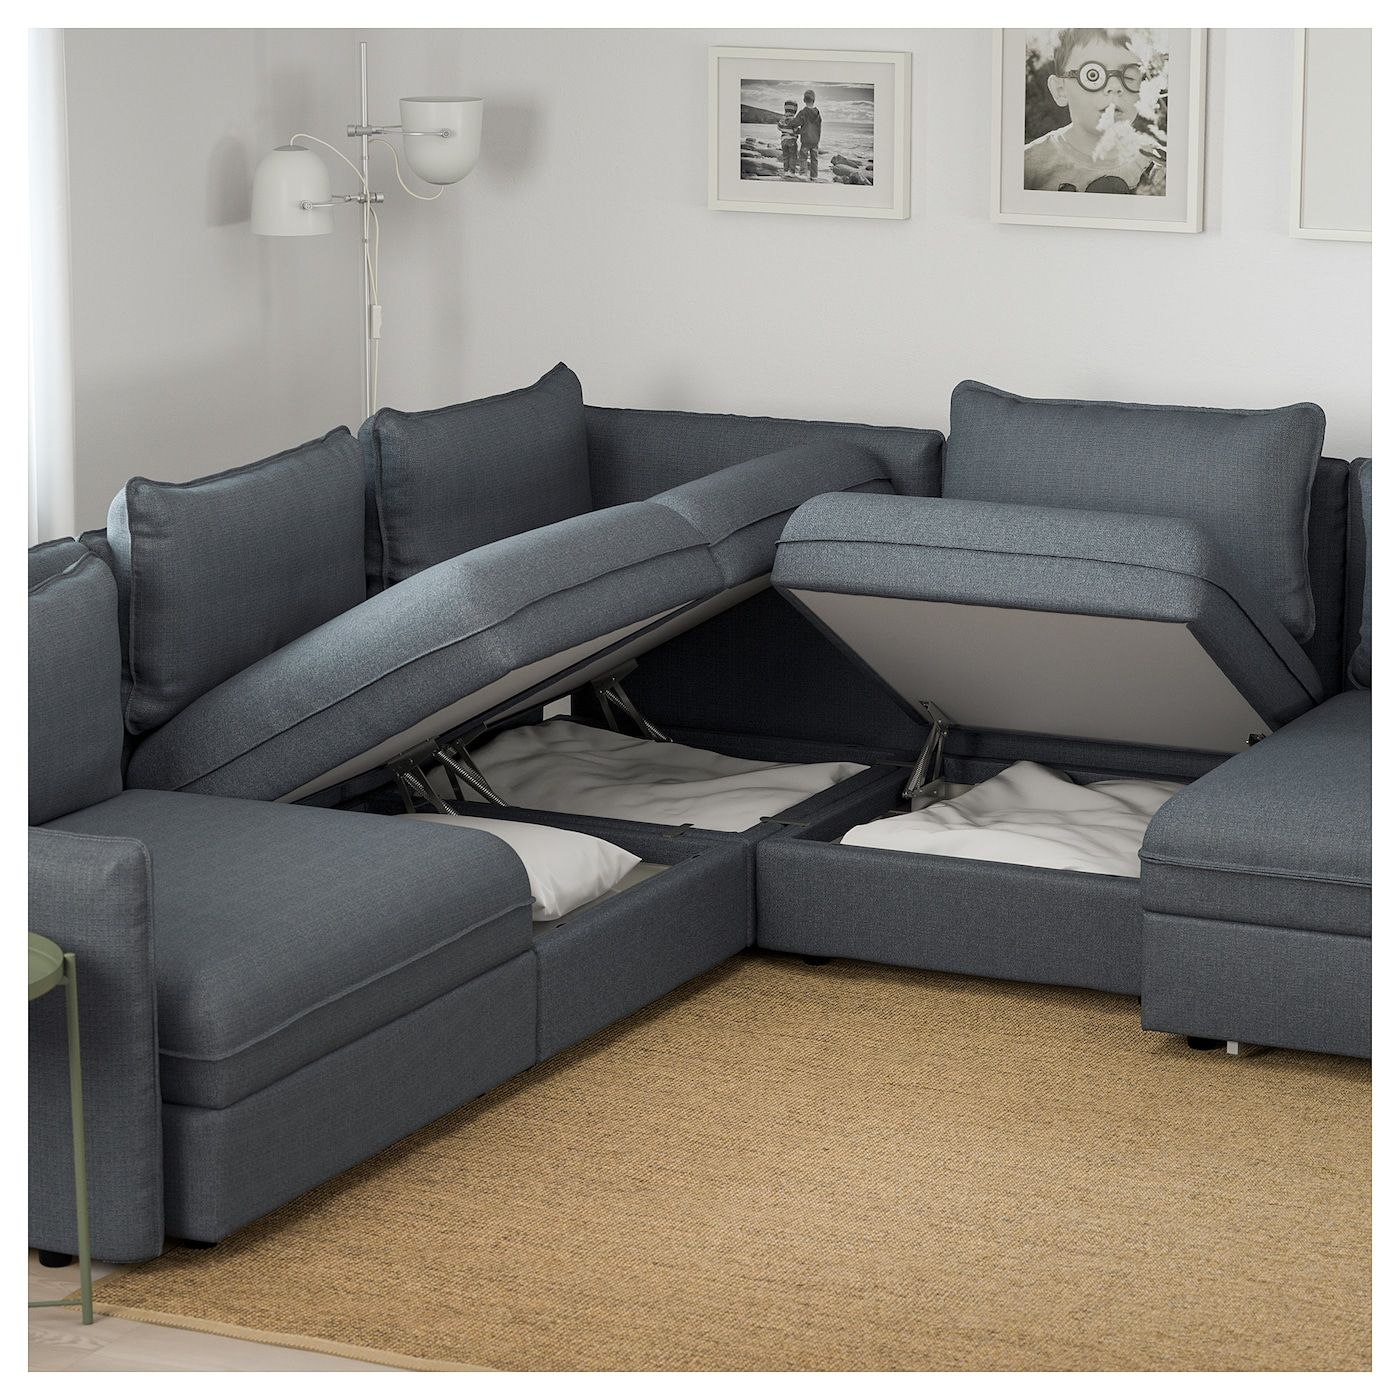 Peachy Us Furniture And Home Furnishings In 2019 Furniture Machost Co Dining Chair Design Ideas Machostcouk